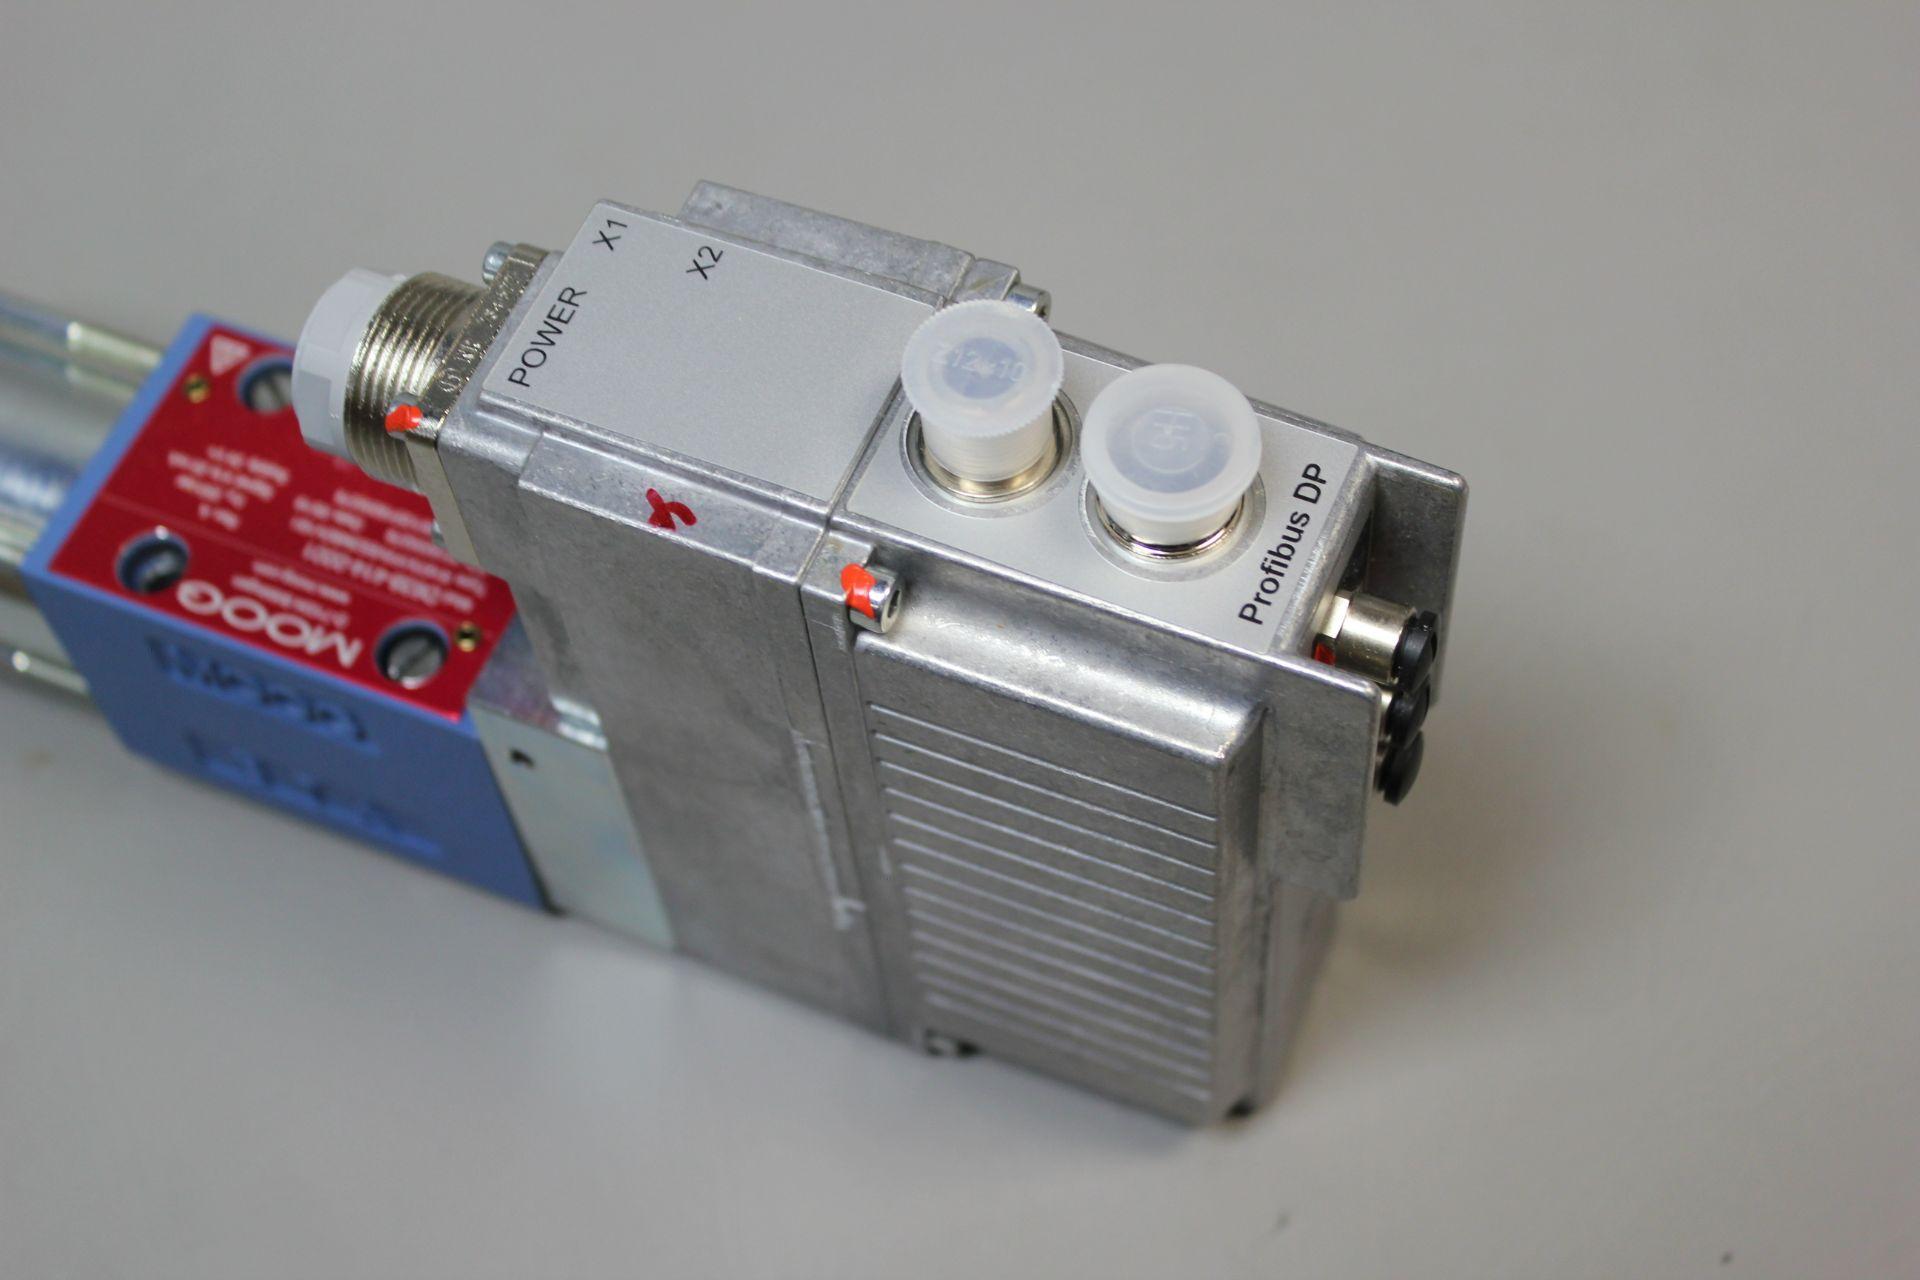 NEW MOOG DIRECT DRIVE DIGITAL CONTROL HYDRAULIC SERVO VALVE - Image 10 of 12